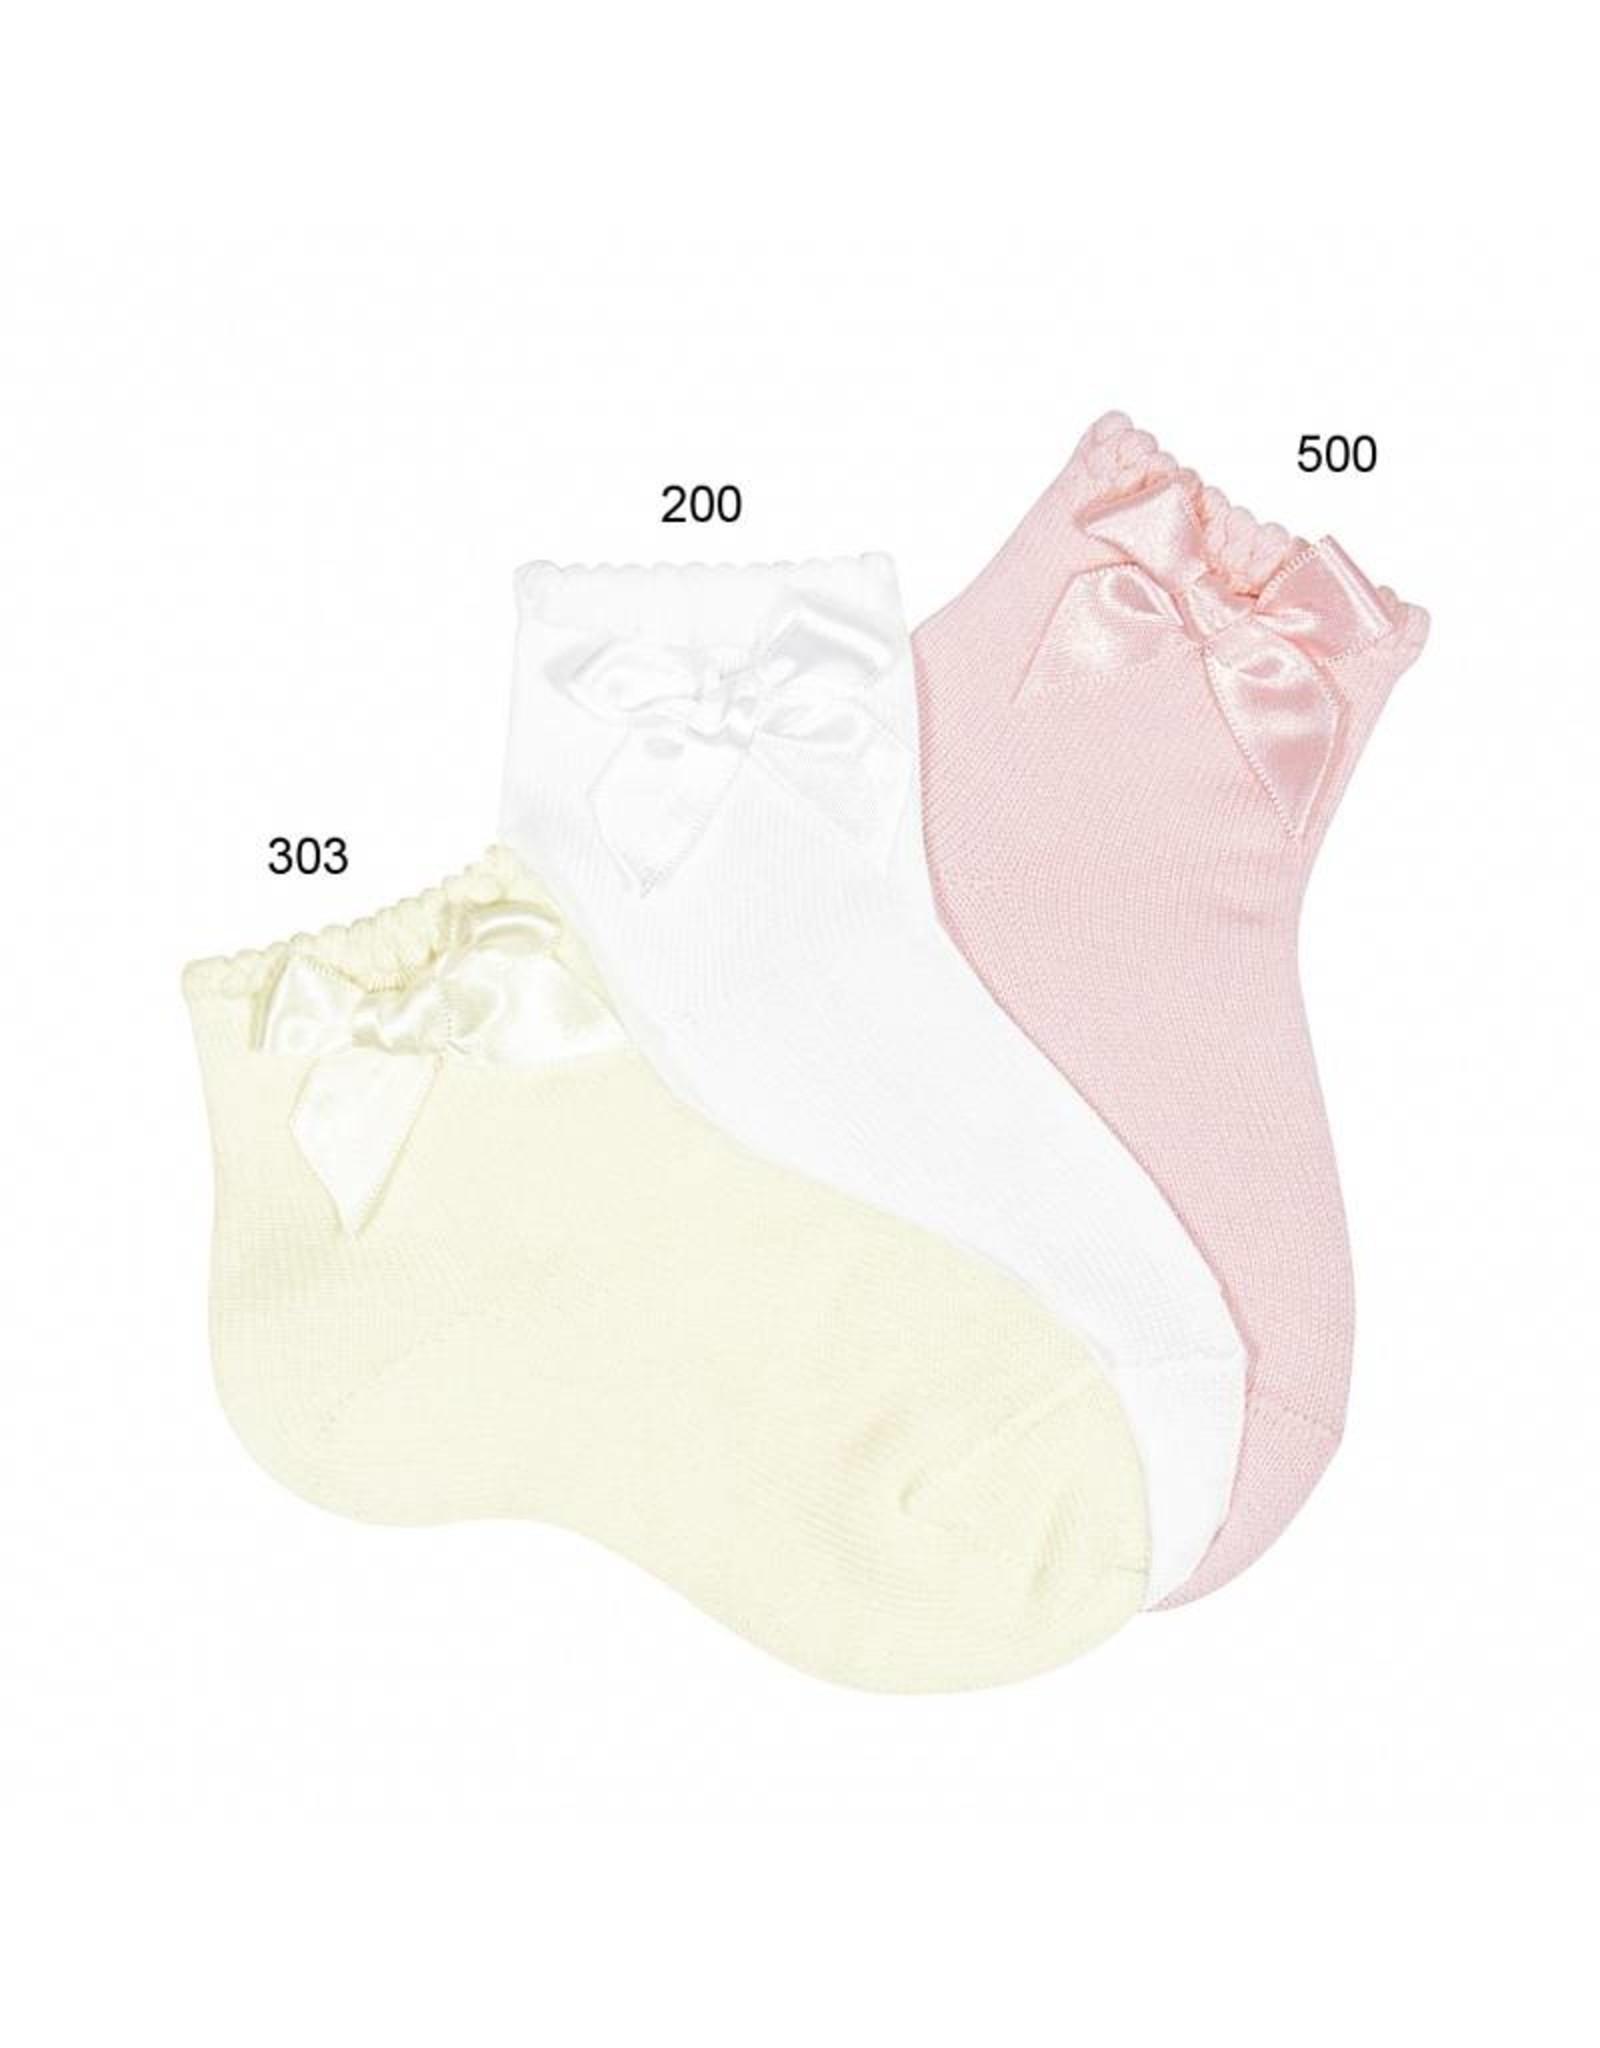 Condor Condor Ceremony Short Socks with matching Bow Rosa